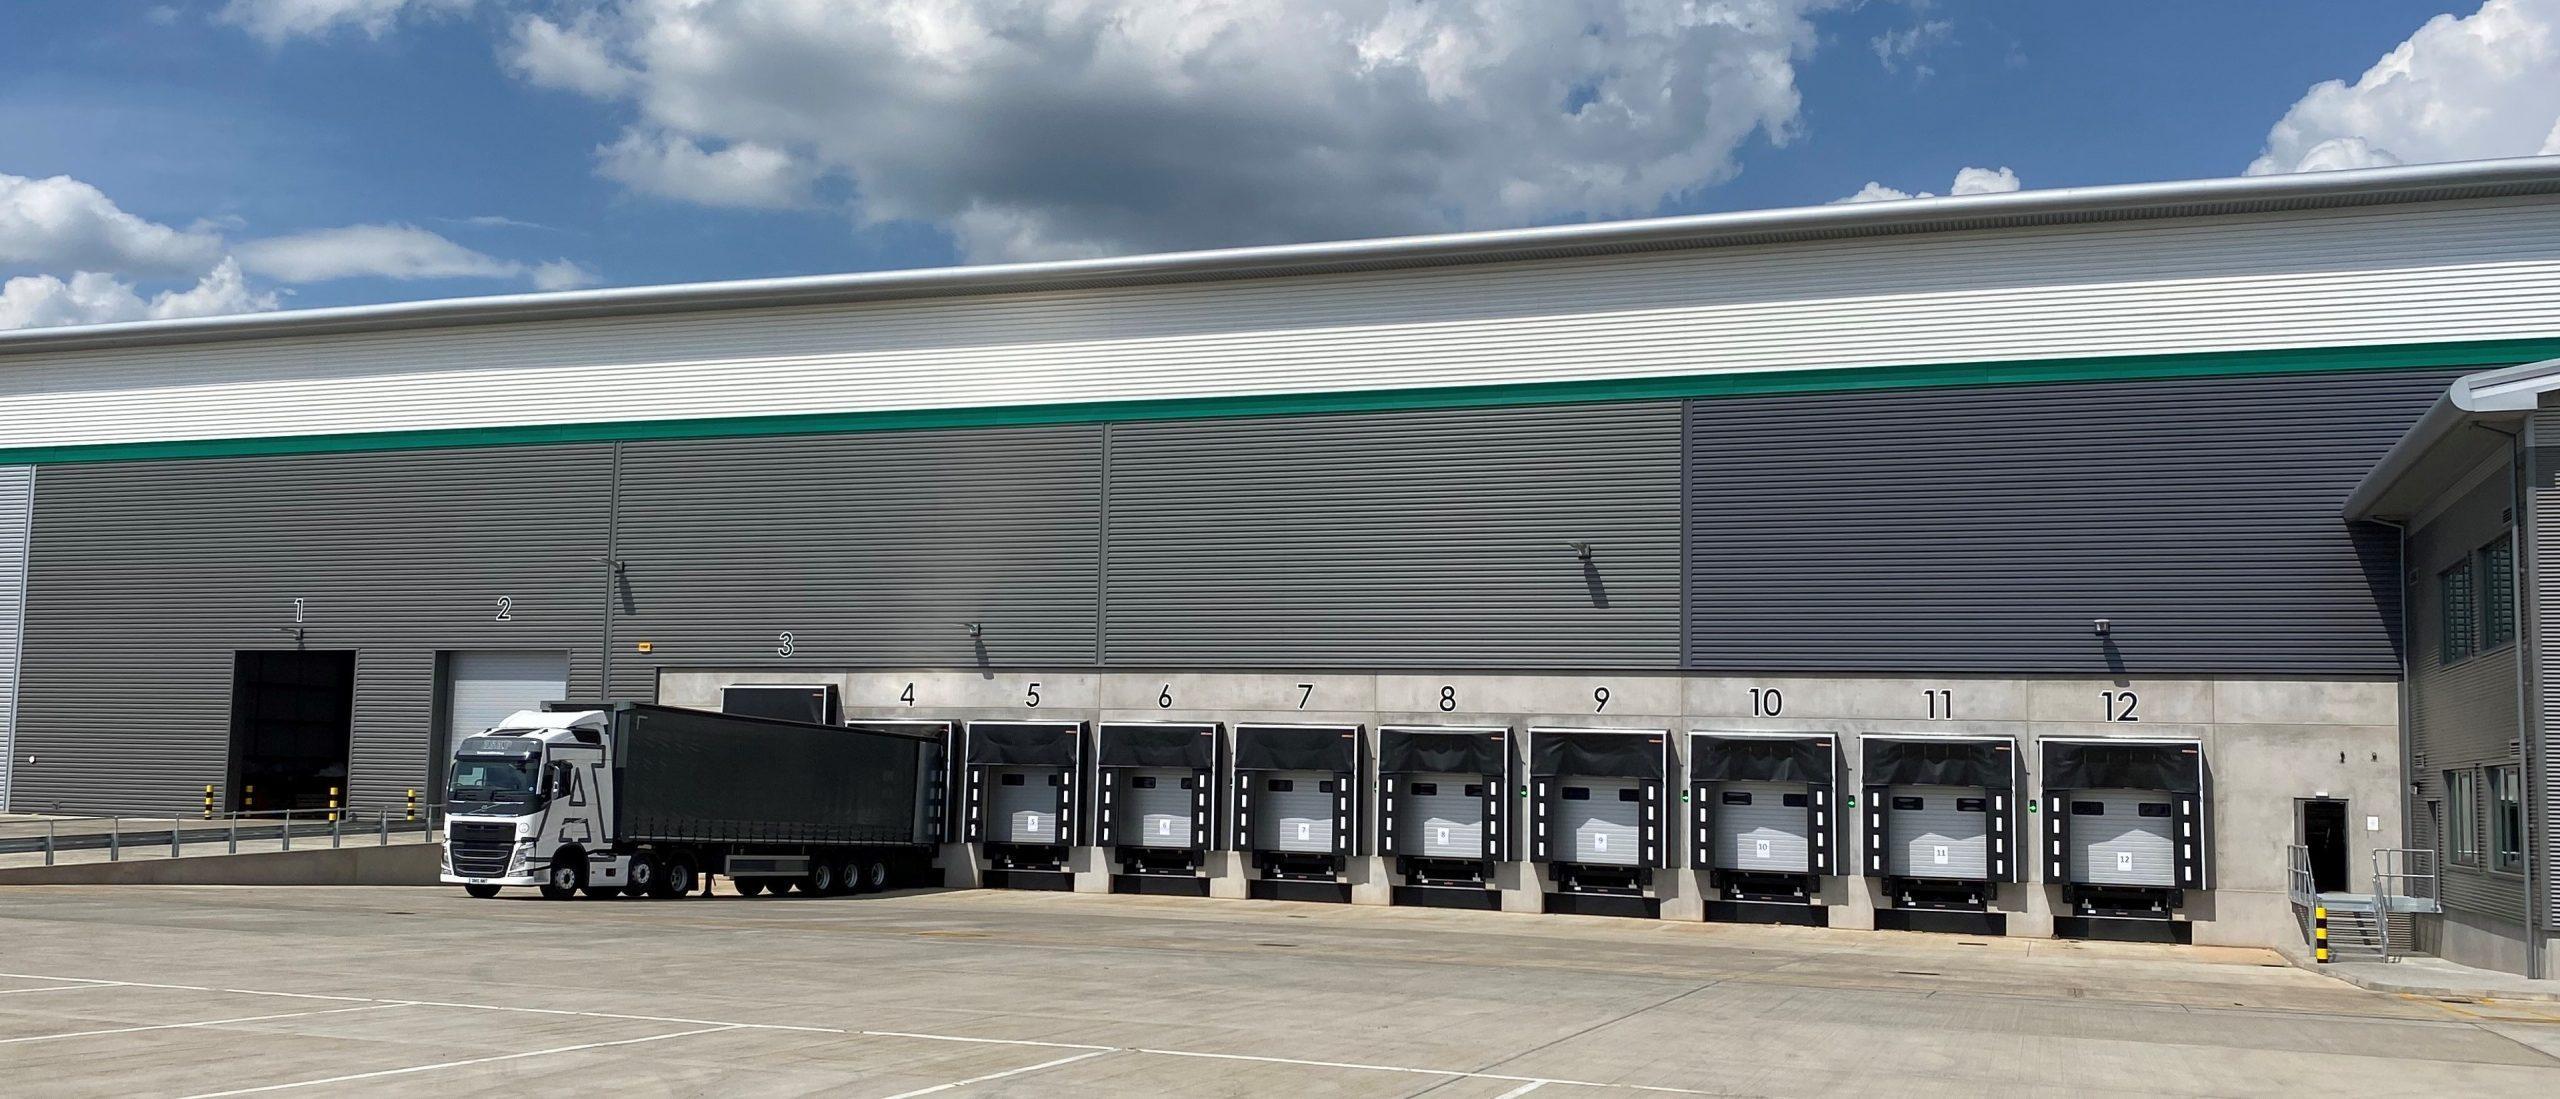 RAJA UK's new packaging warehouse docking bays